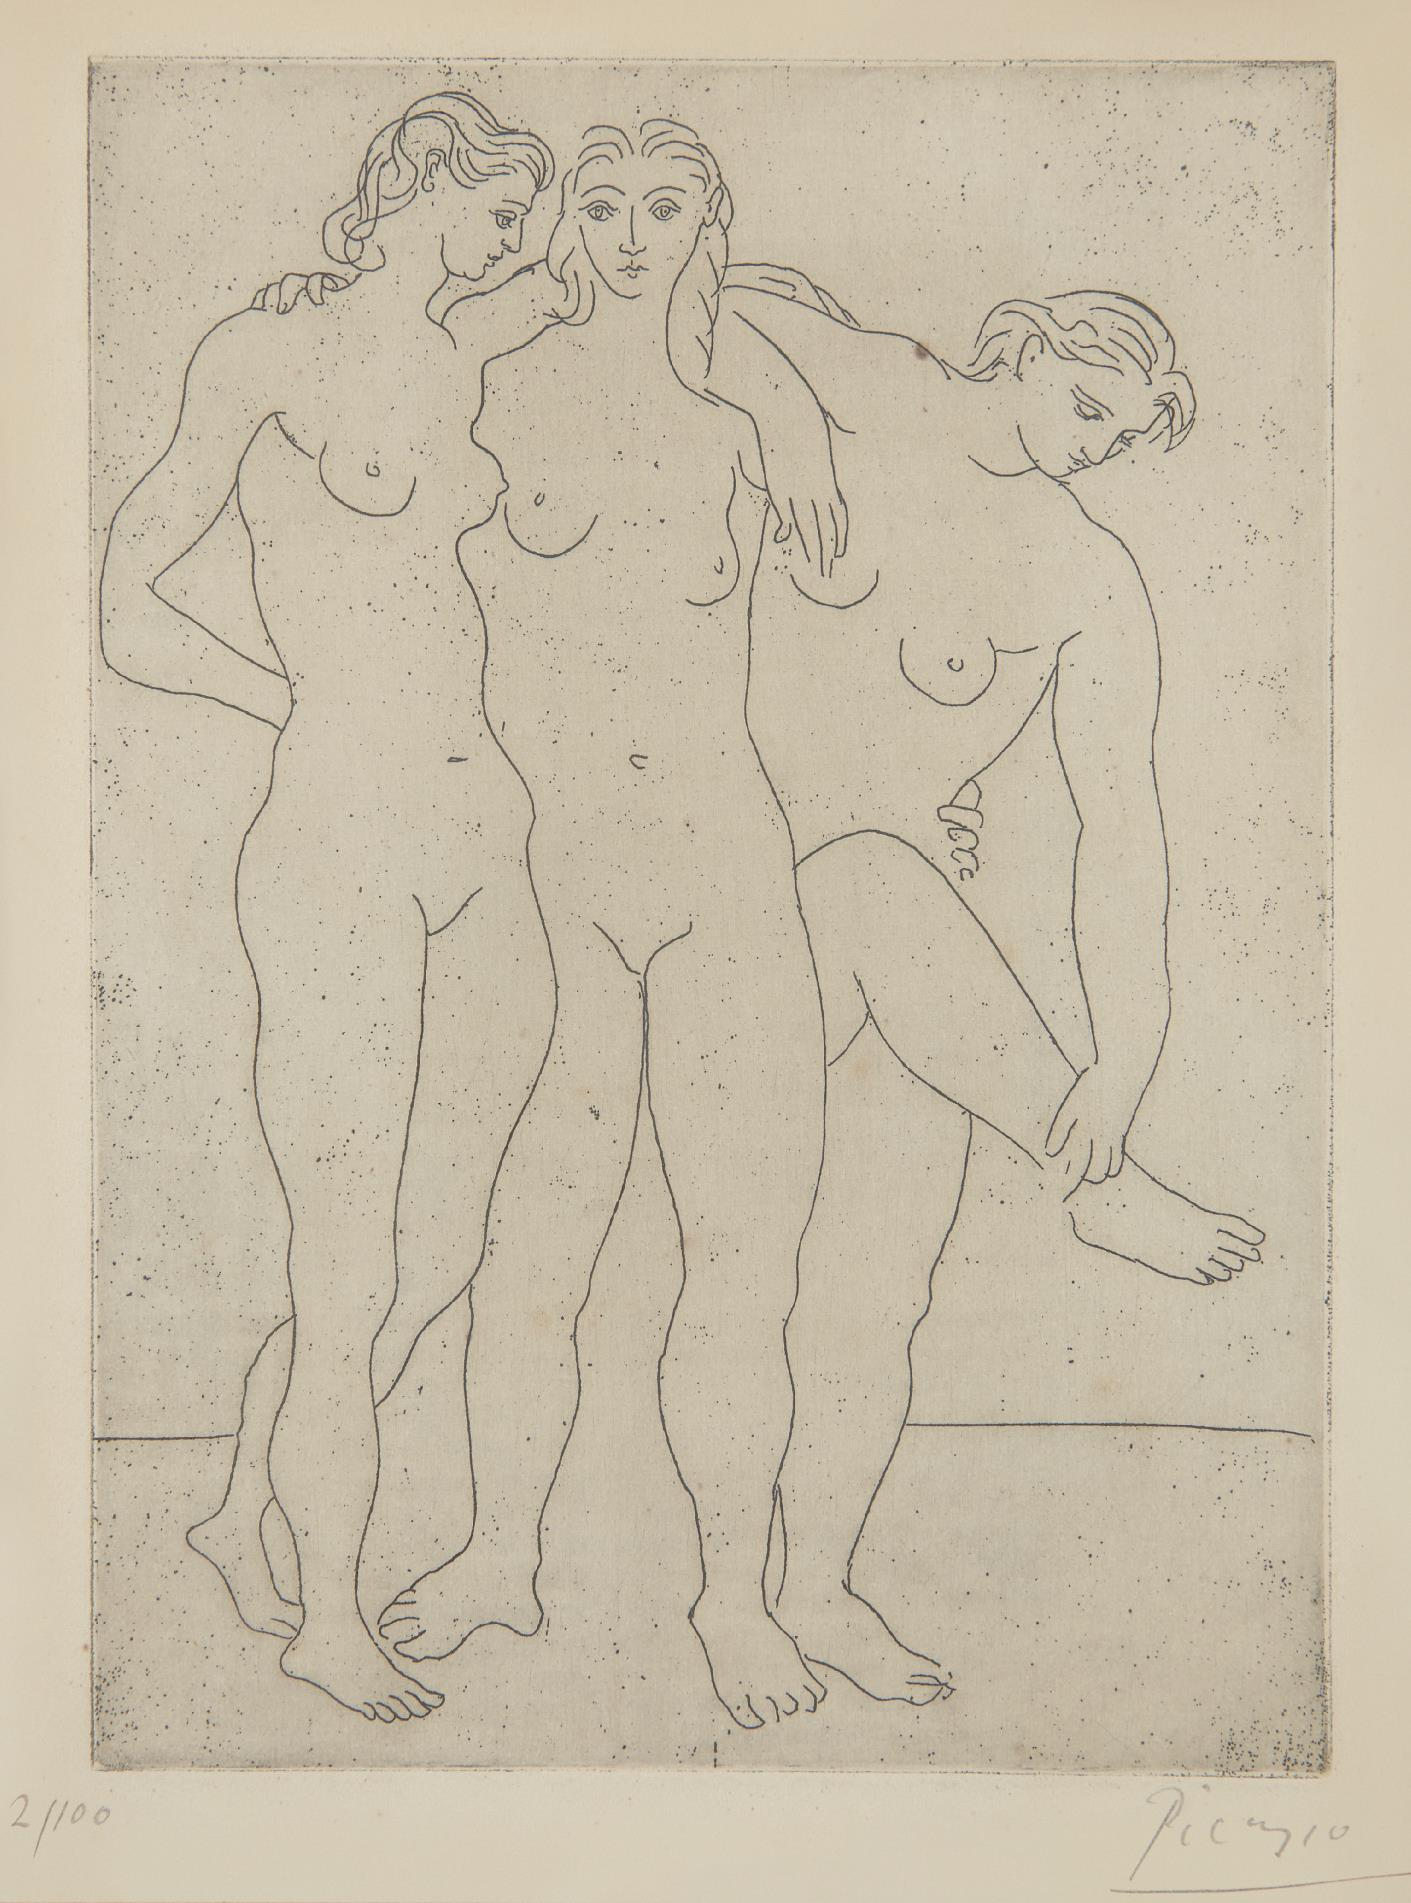 Pablo Picasso-Les trois baigneuses III (Three Bathers III)-1923